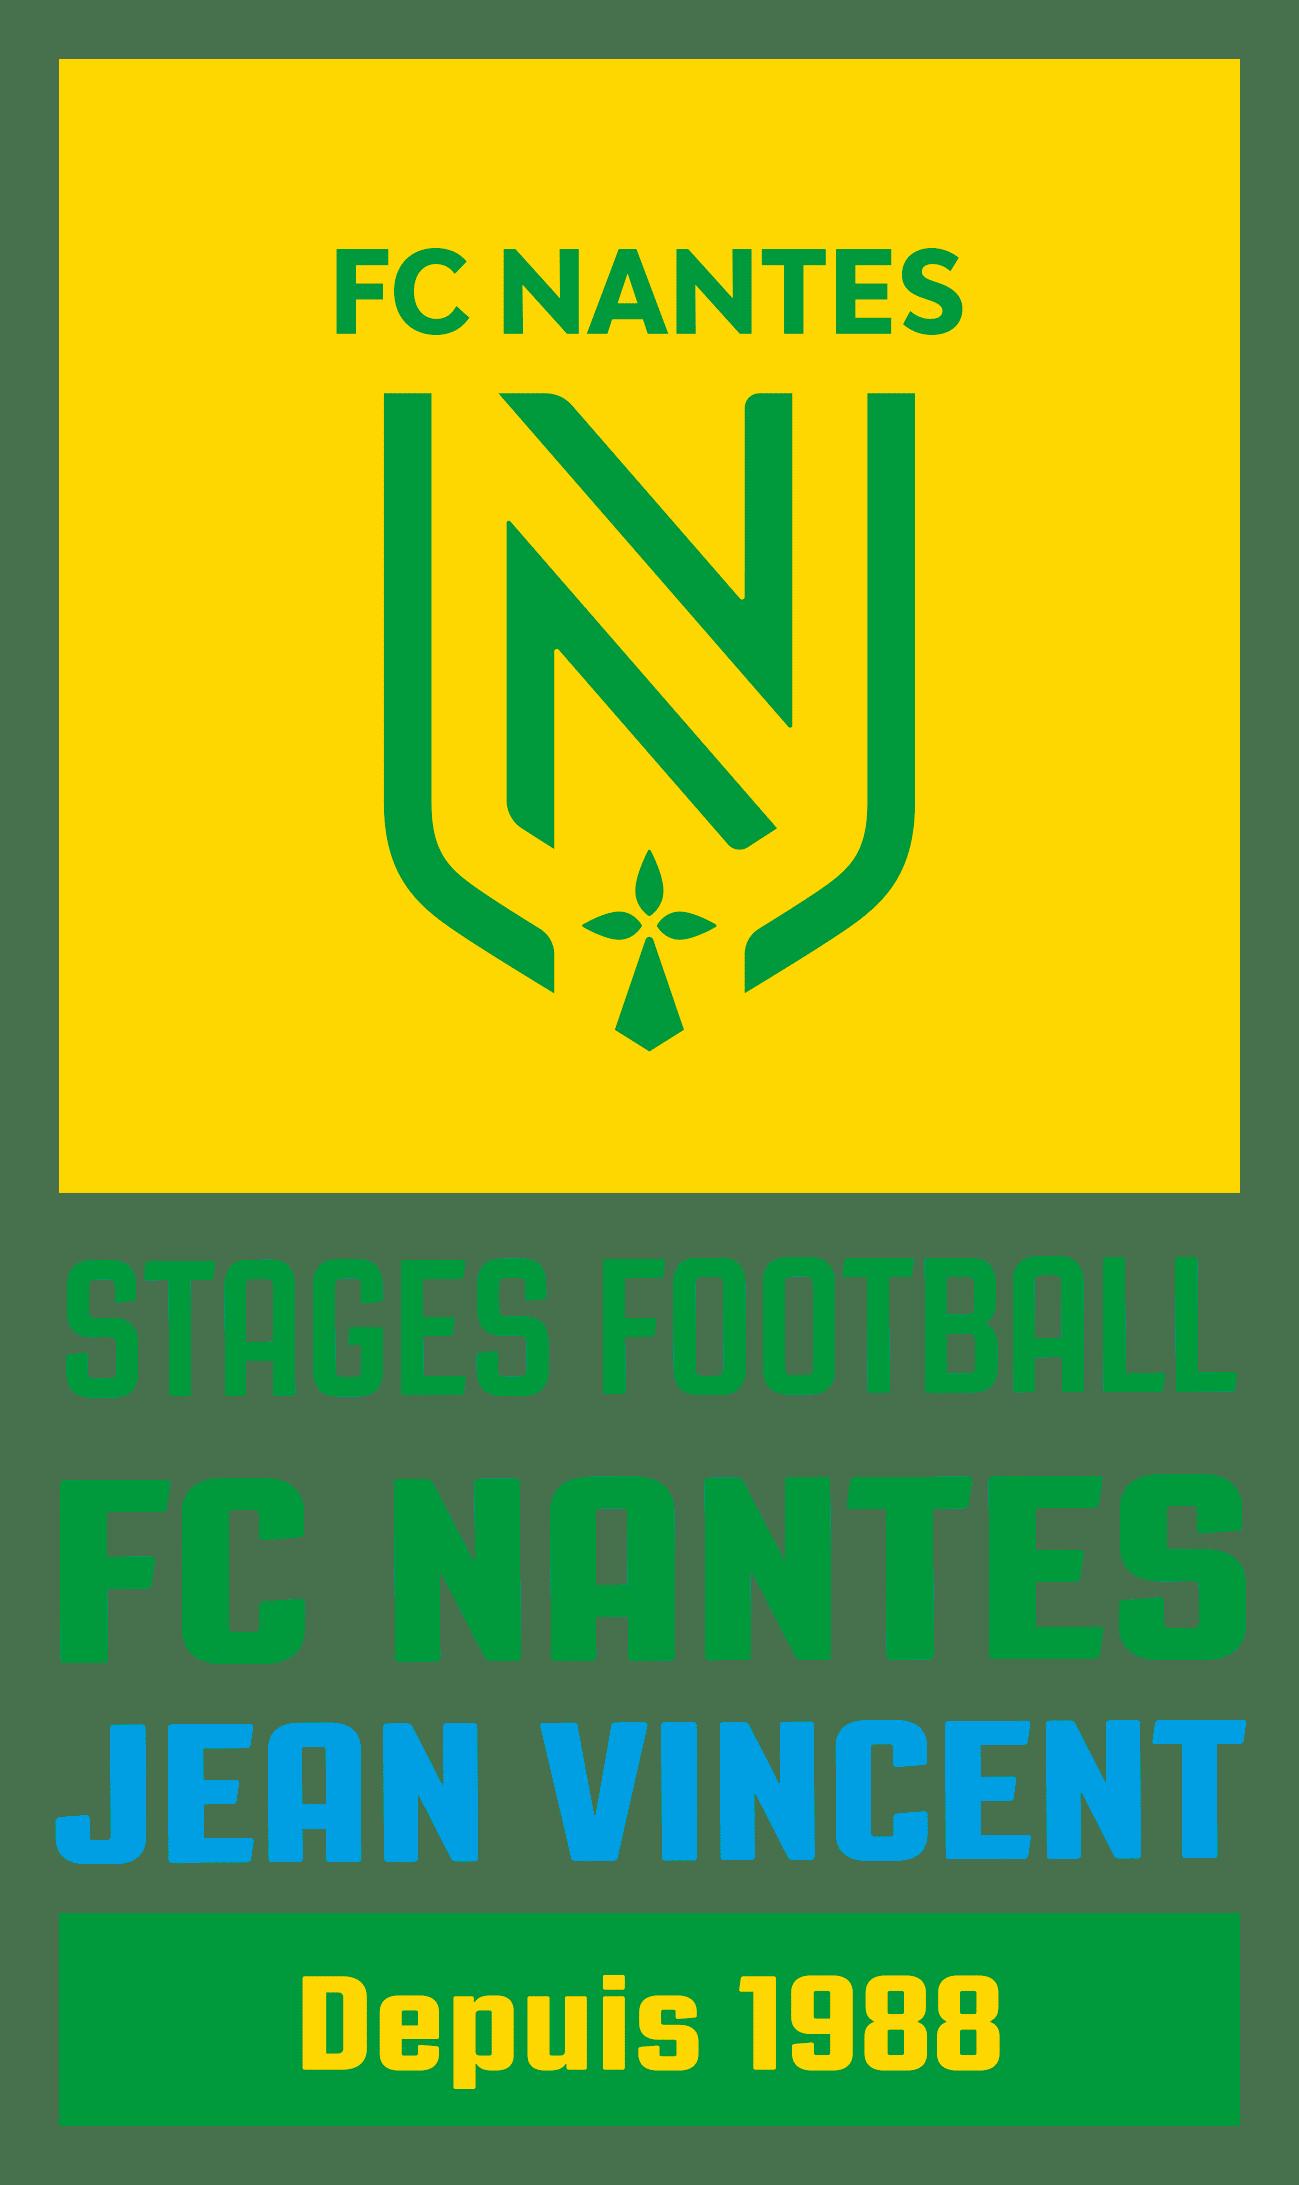 FCNANTES JEAN VINCENT logo